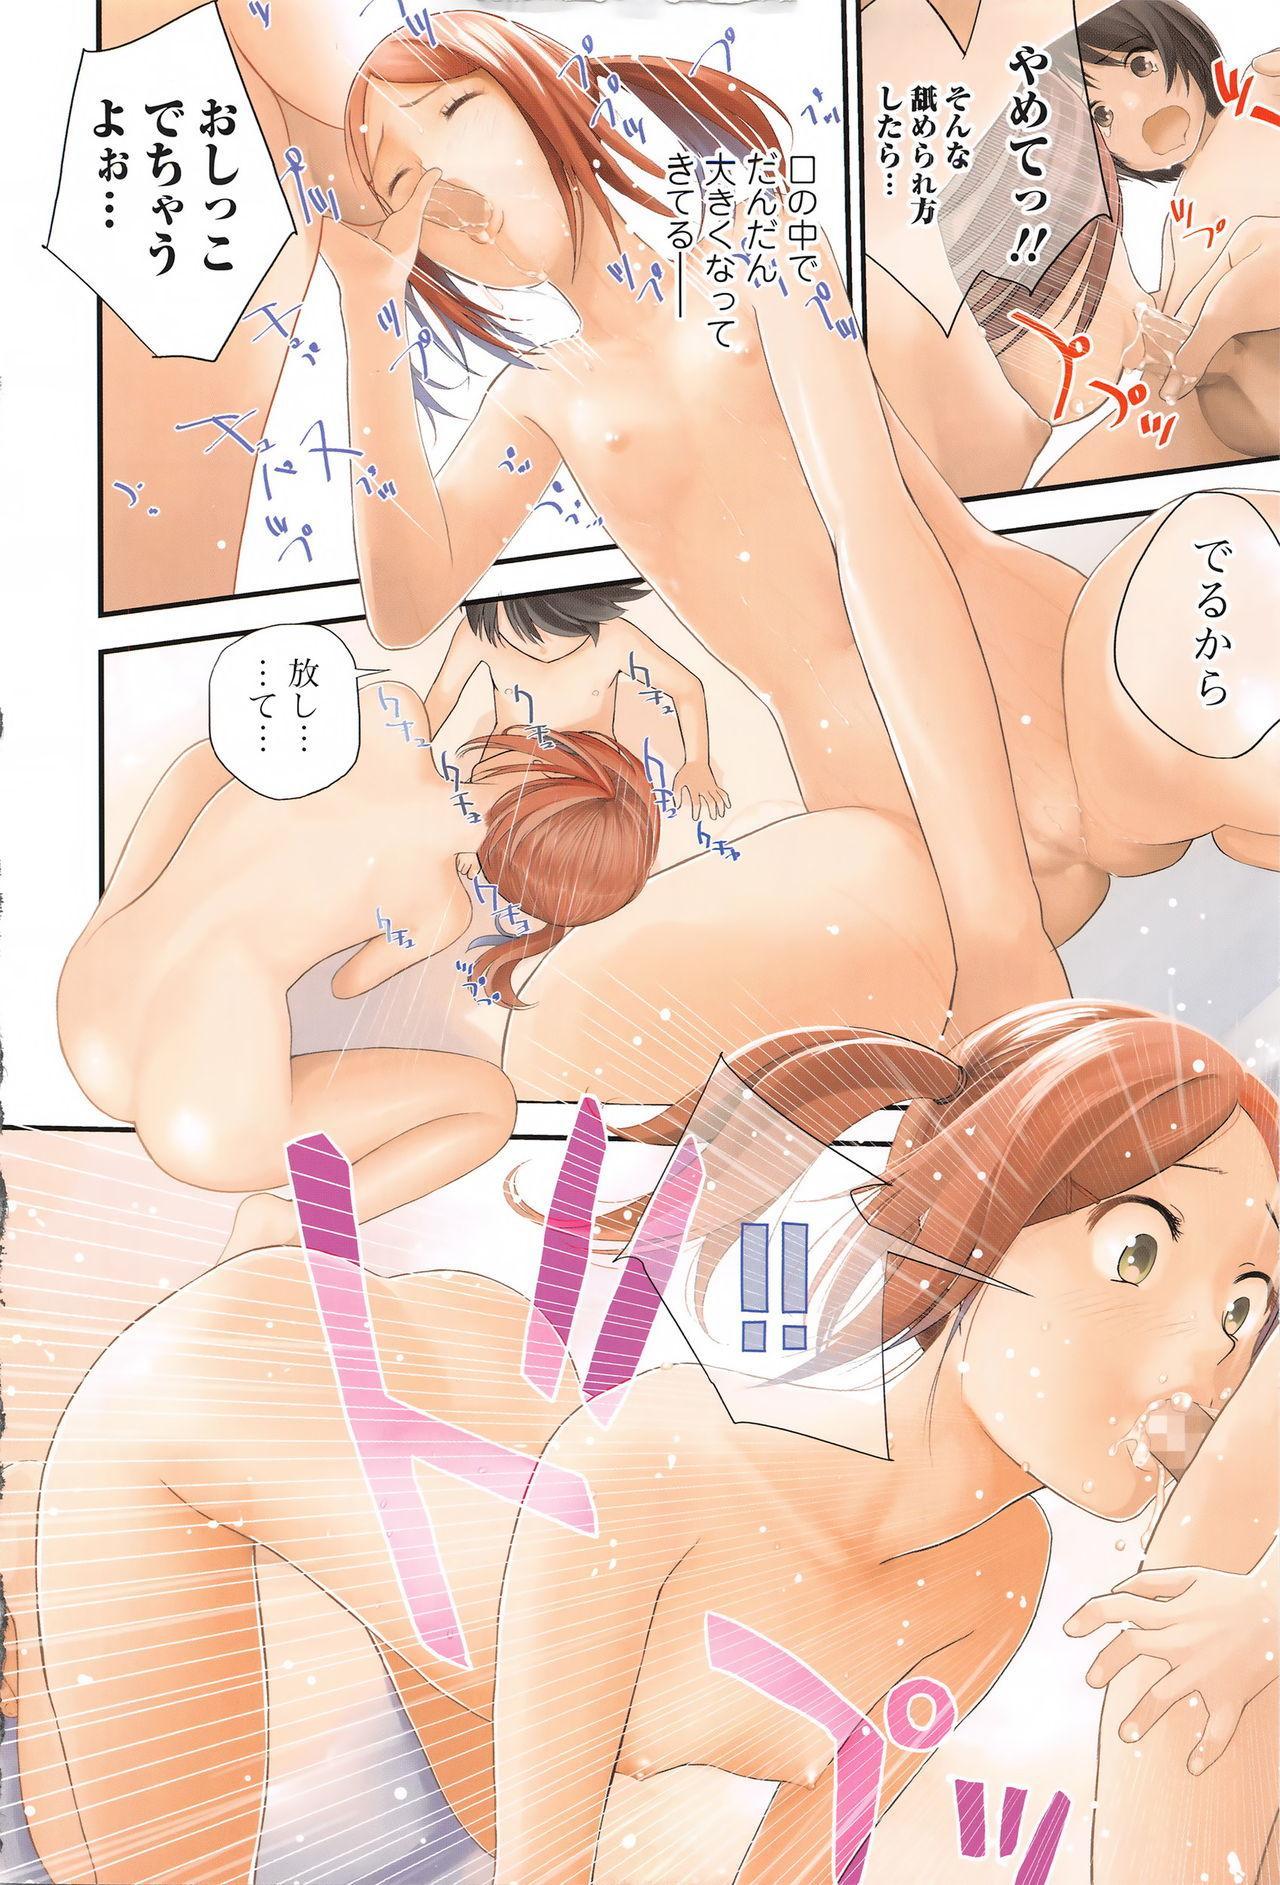 Comic JSCK Vol.4 2016-05 6